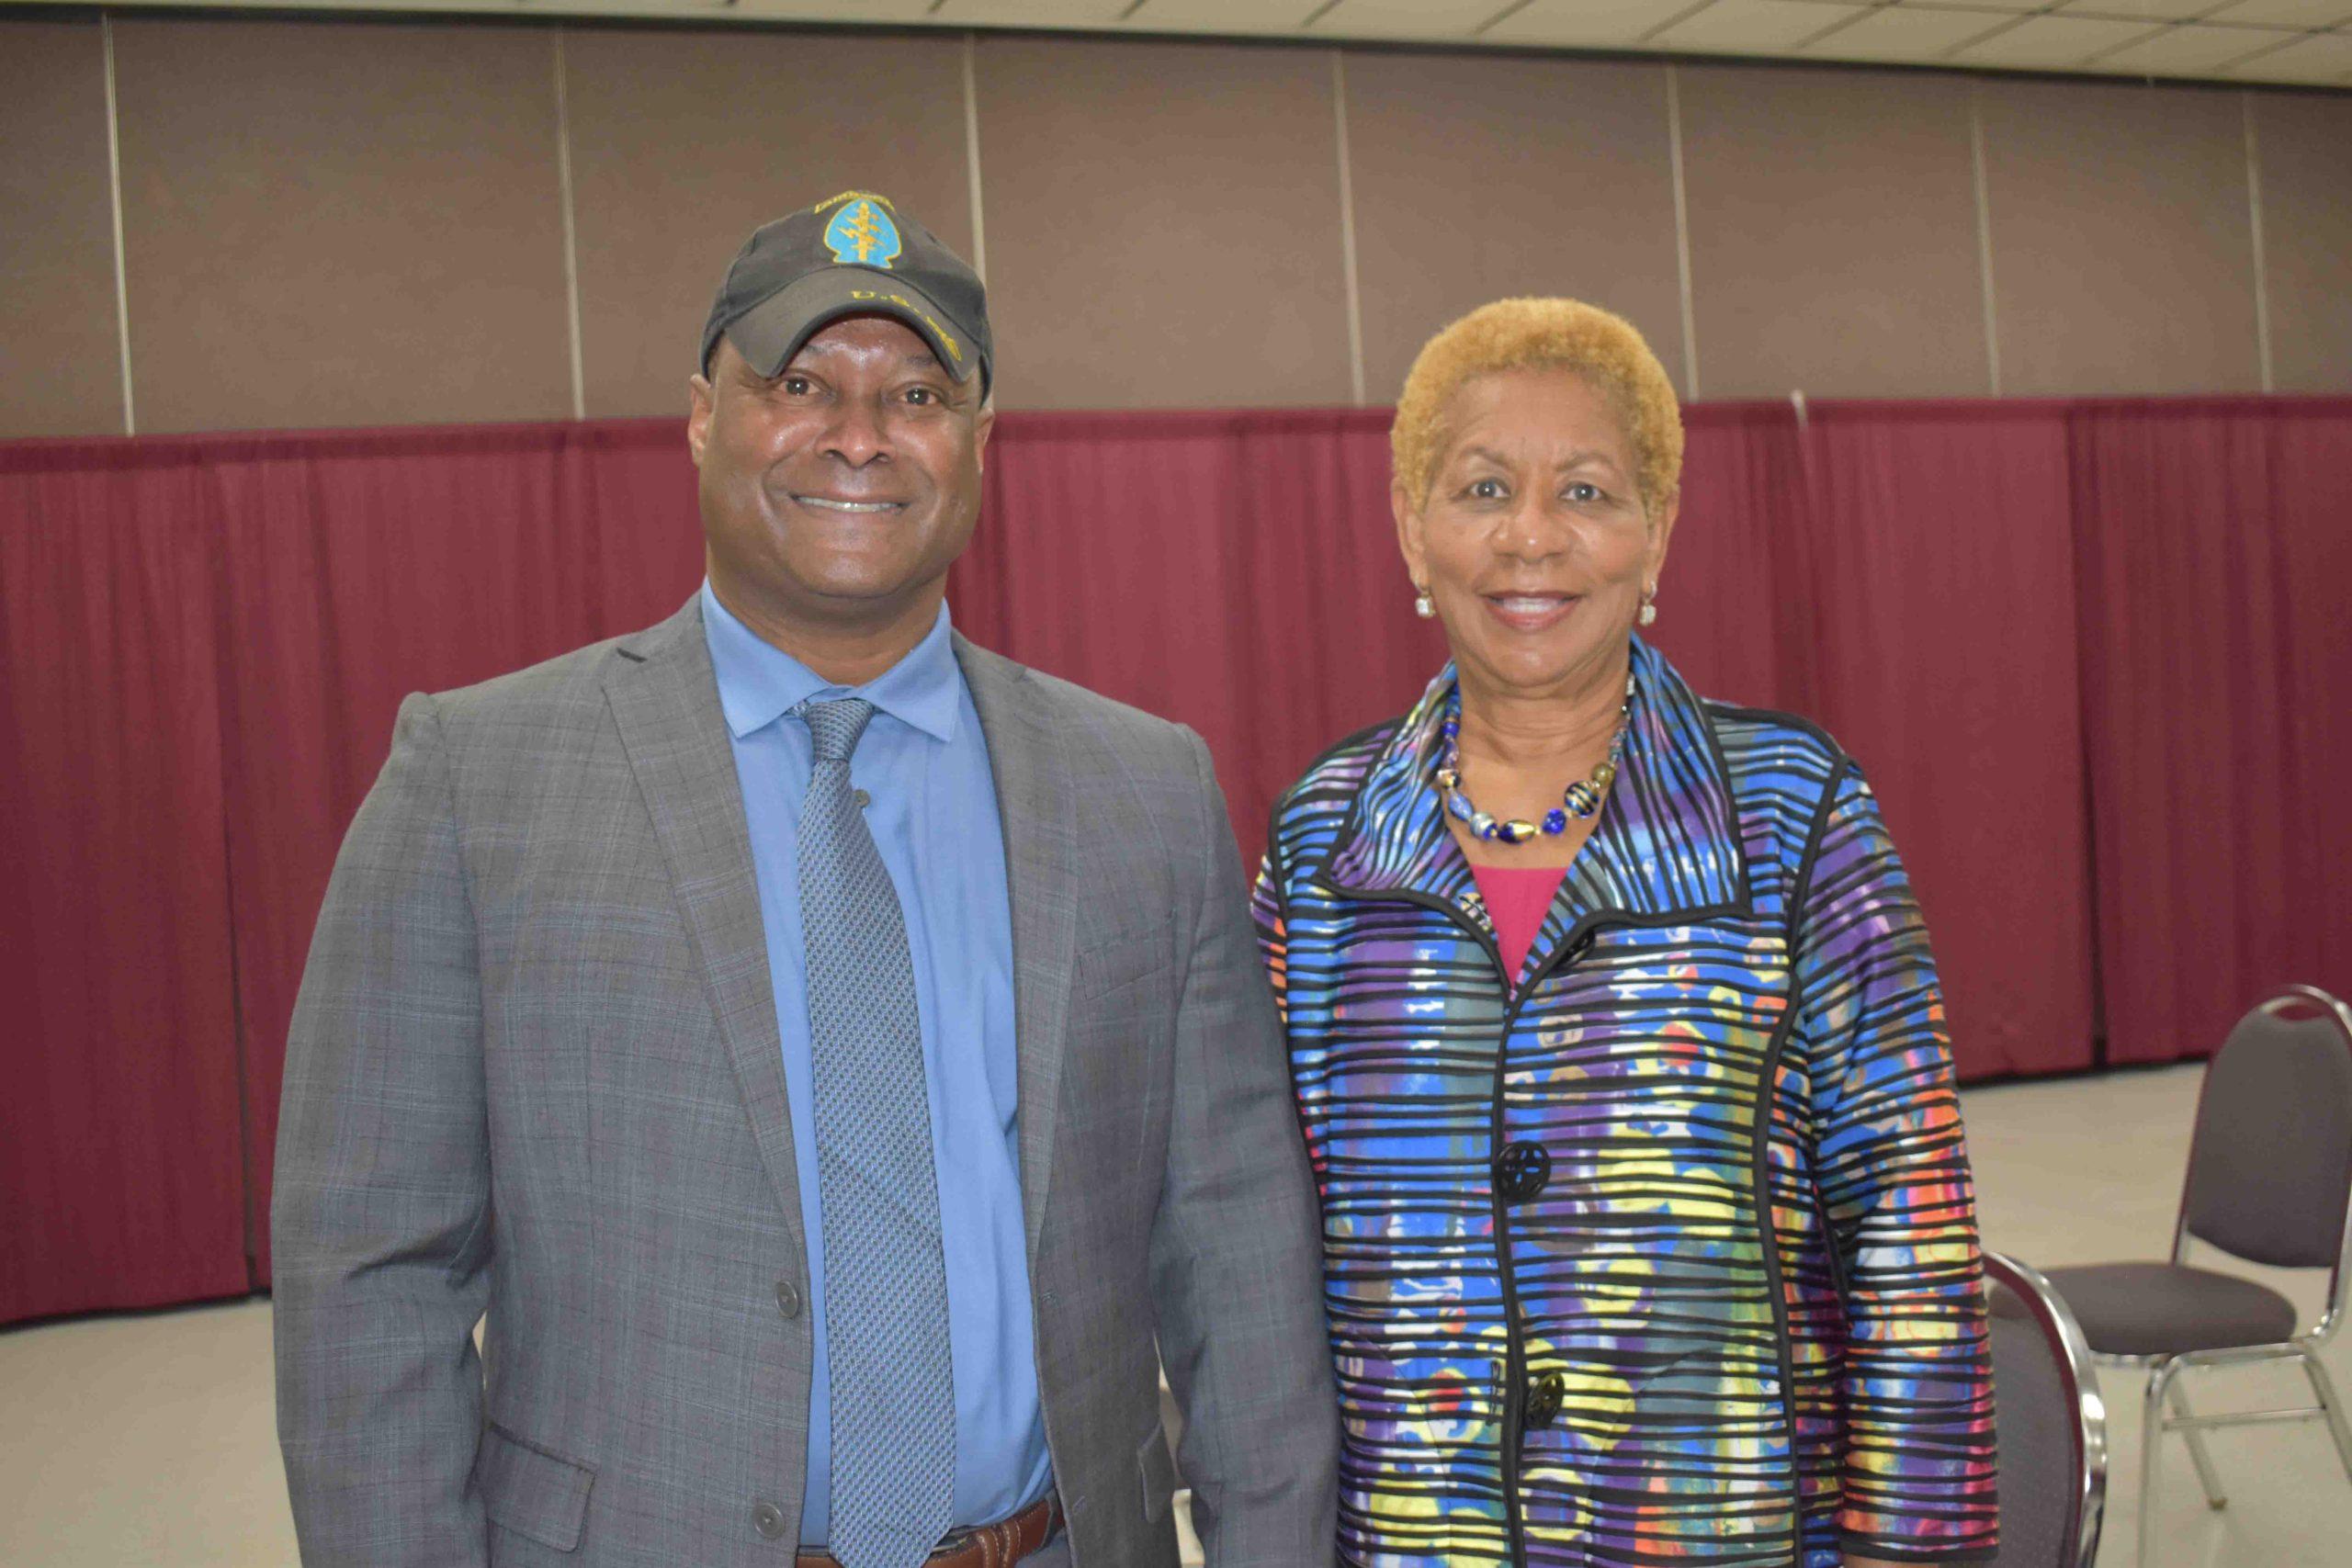 Infectious Disease Expert, Dr. Lane Rolling, Pine Bluff Mayor Shirley Washington